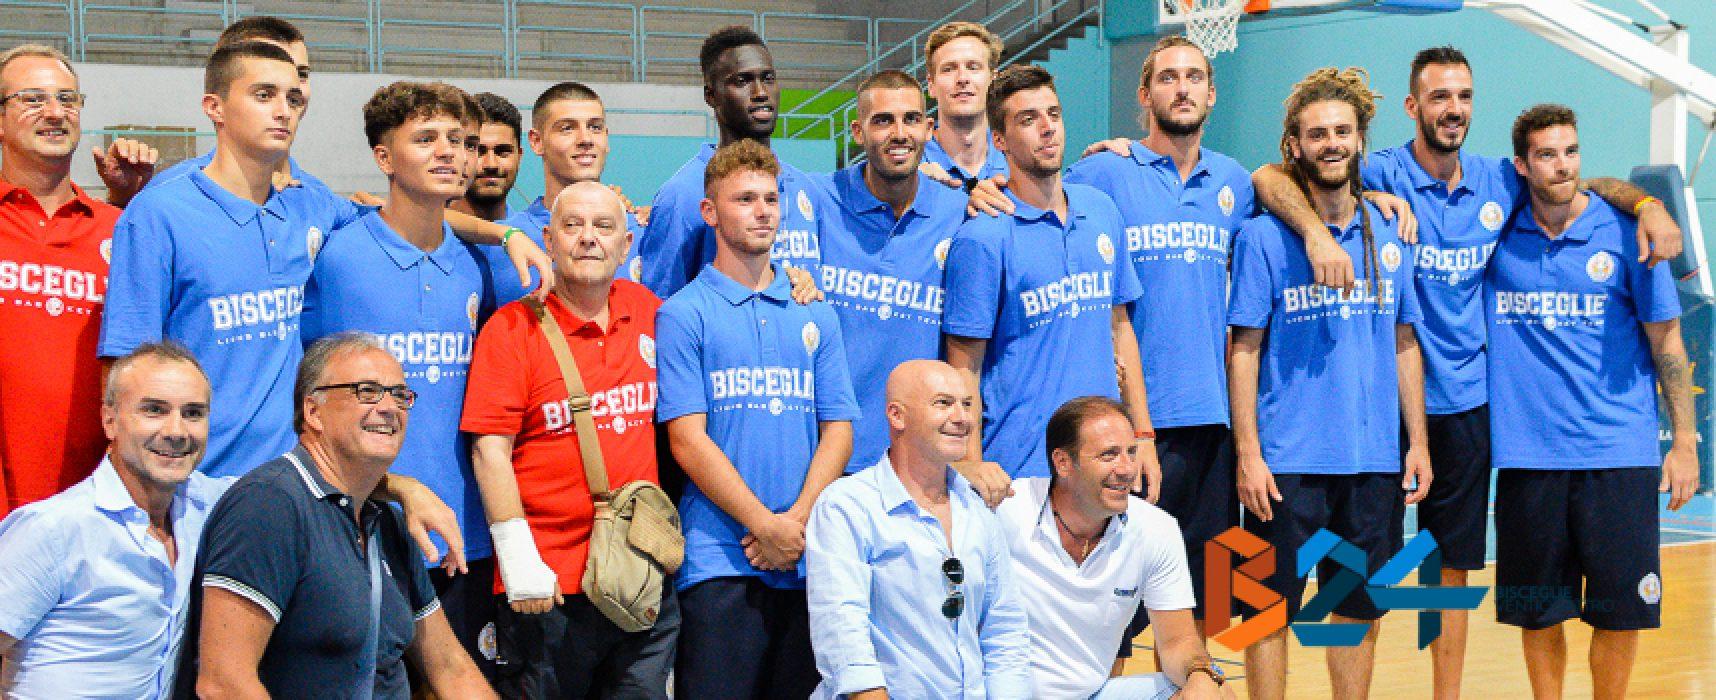 Basket, Di Pinto Panifici Bisceglie pronti all'esordio casalingo contro Pescara